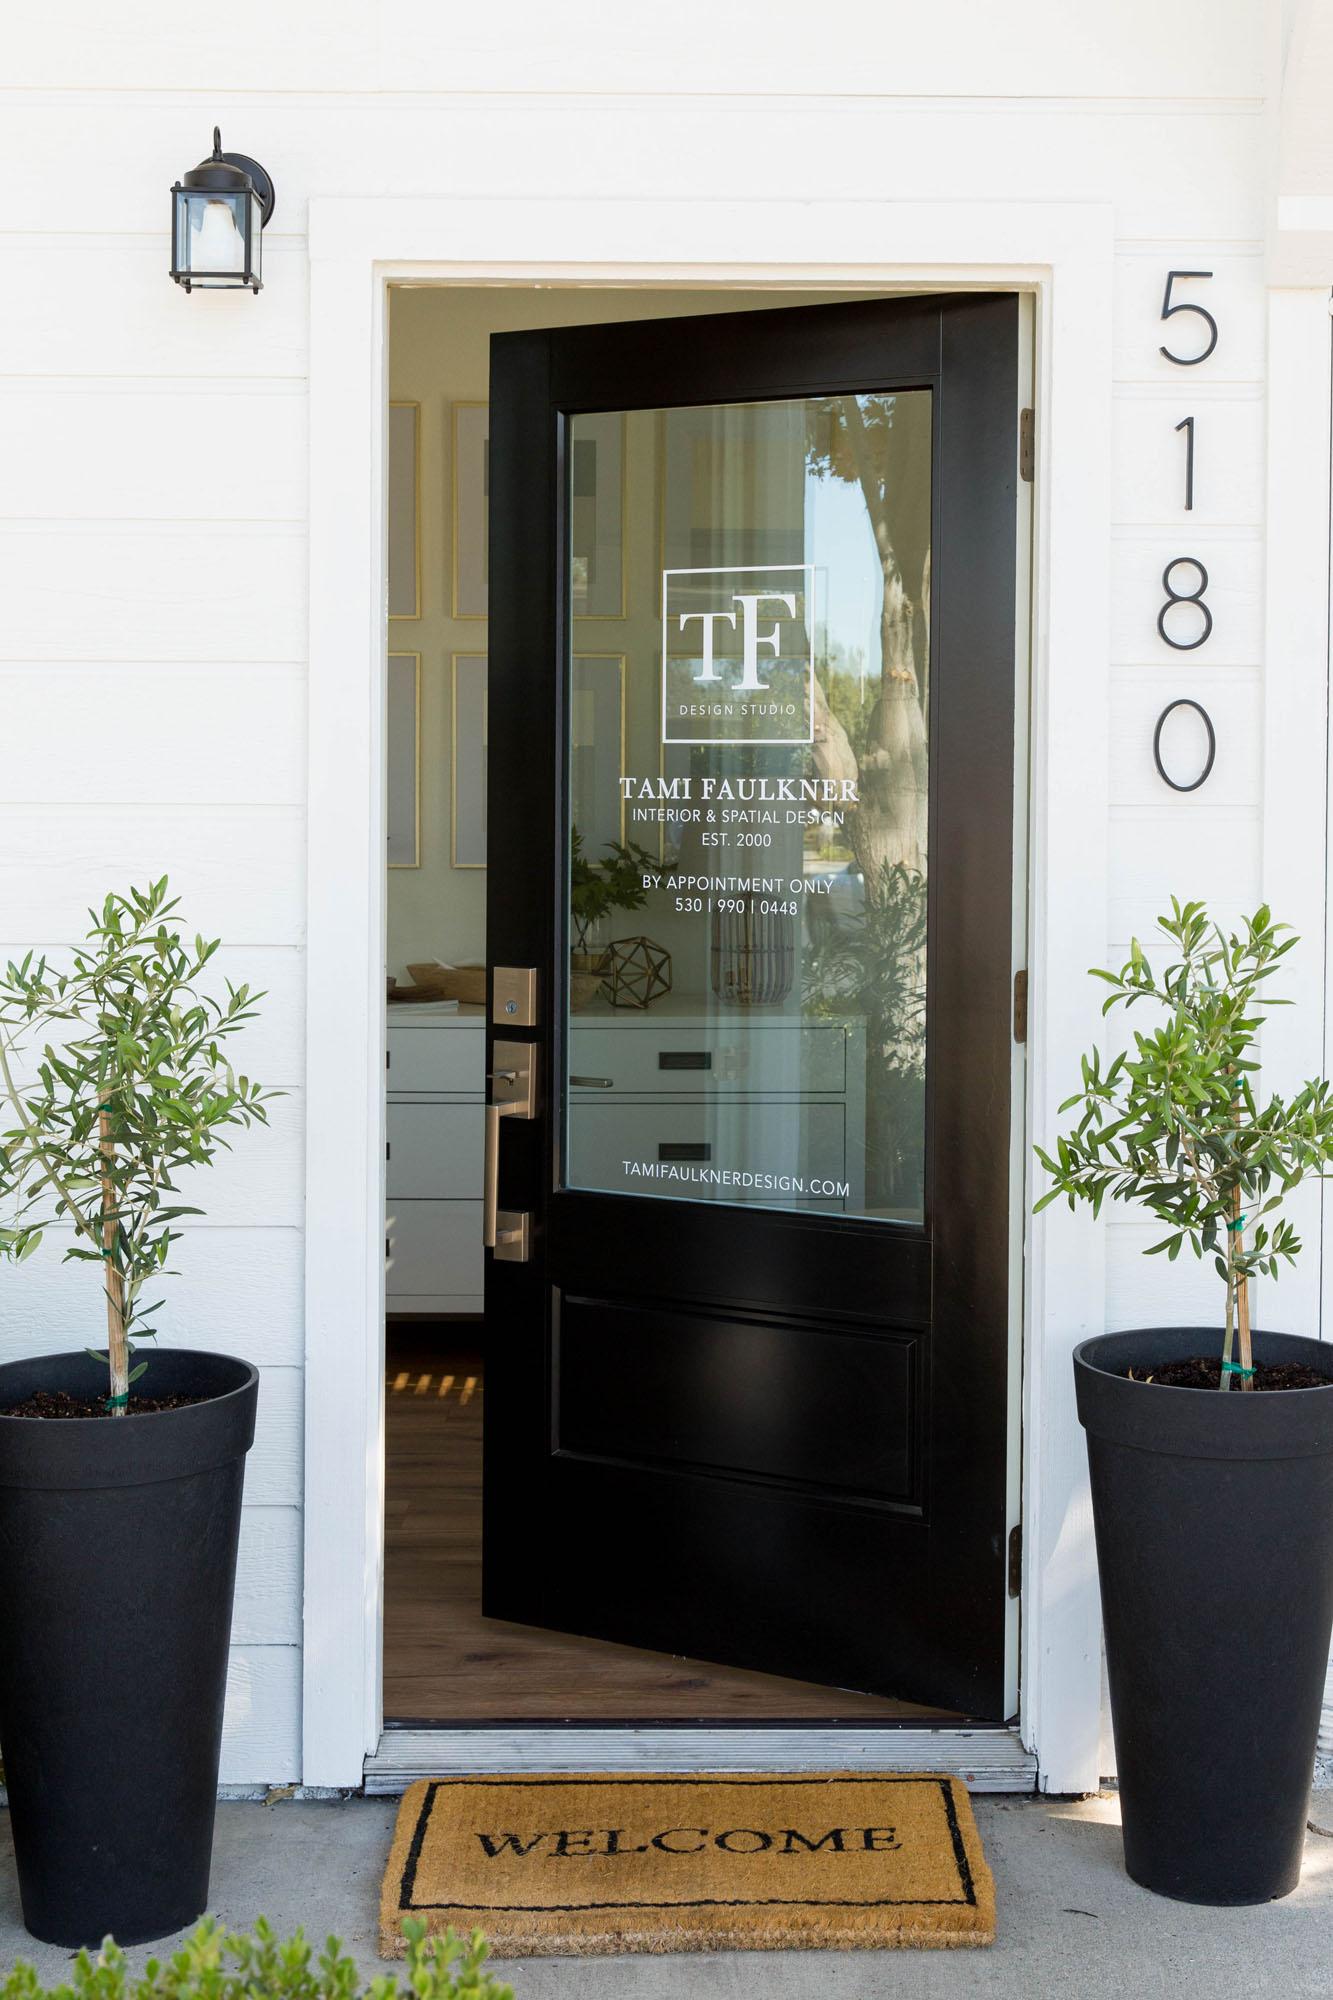 Tami Faulkner Studio entrance - spatial designer.jpg